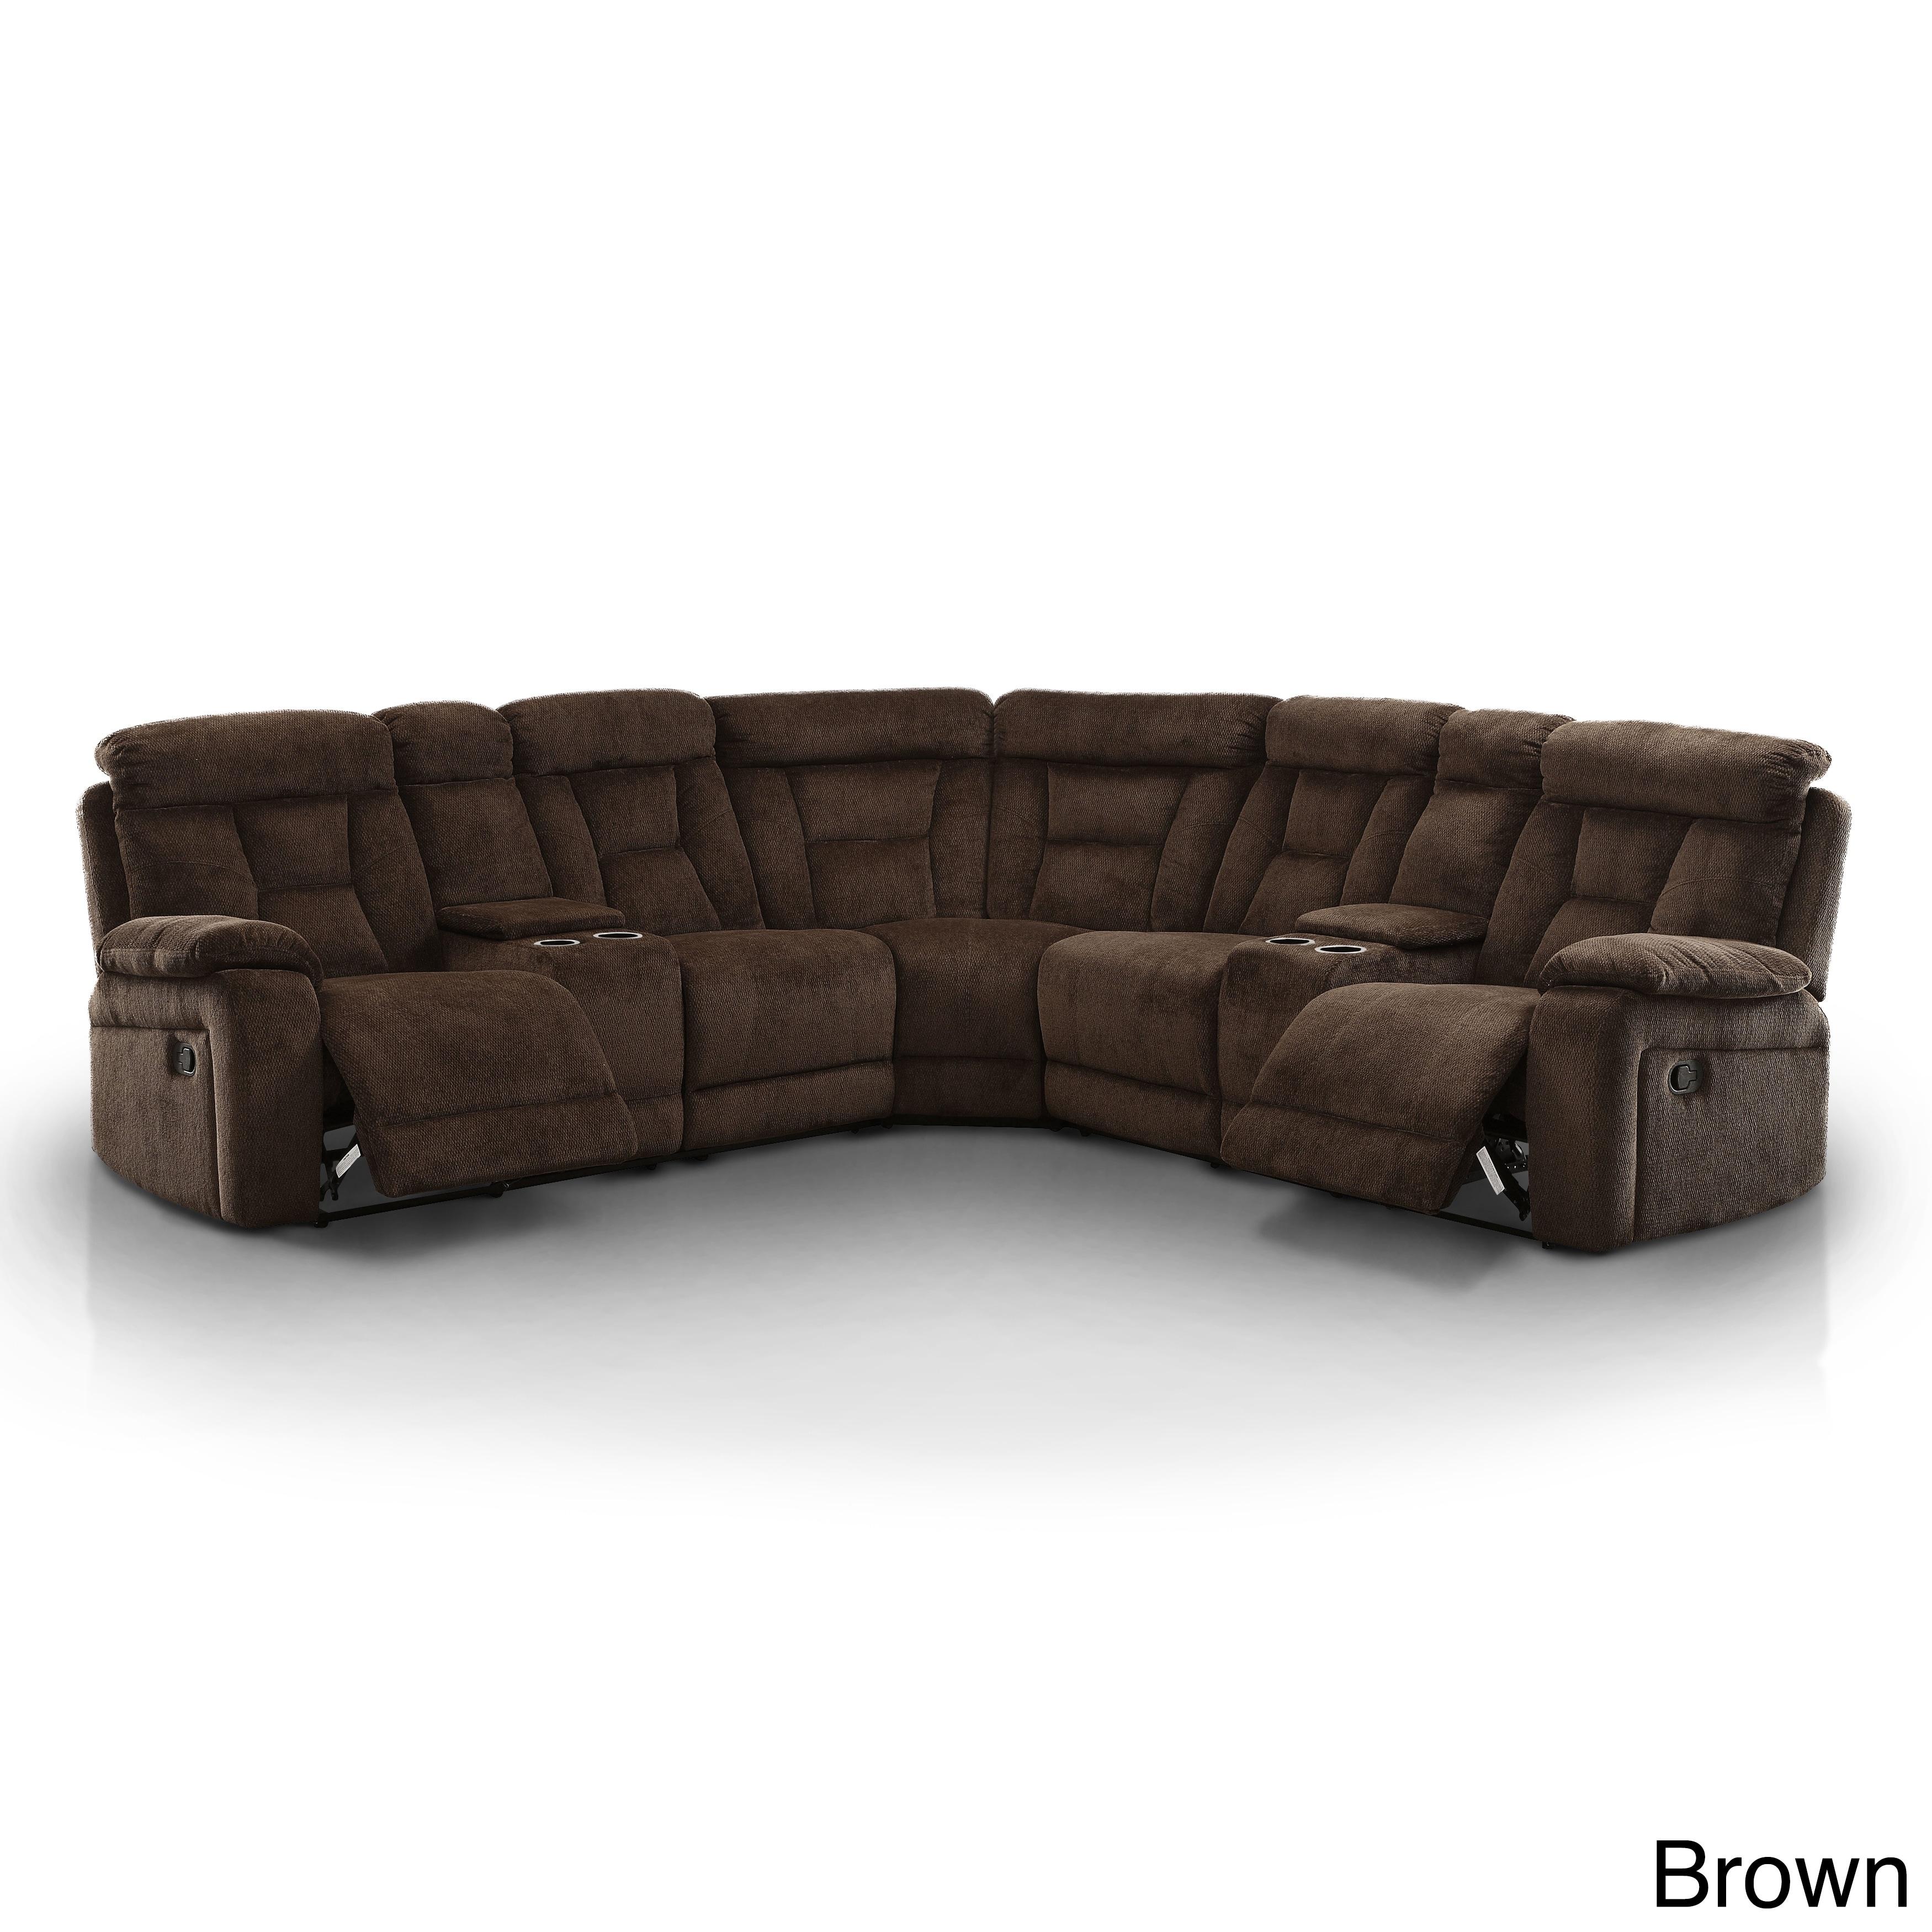 Furniture of America Bristone Chenille Upholstered L-Shap...